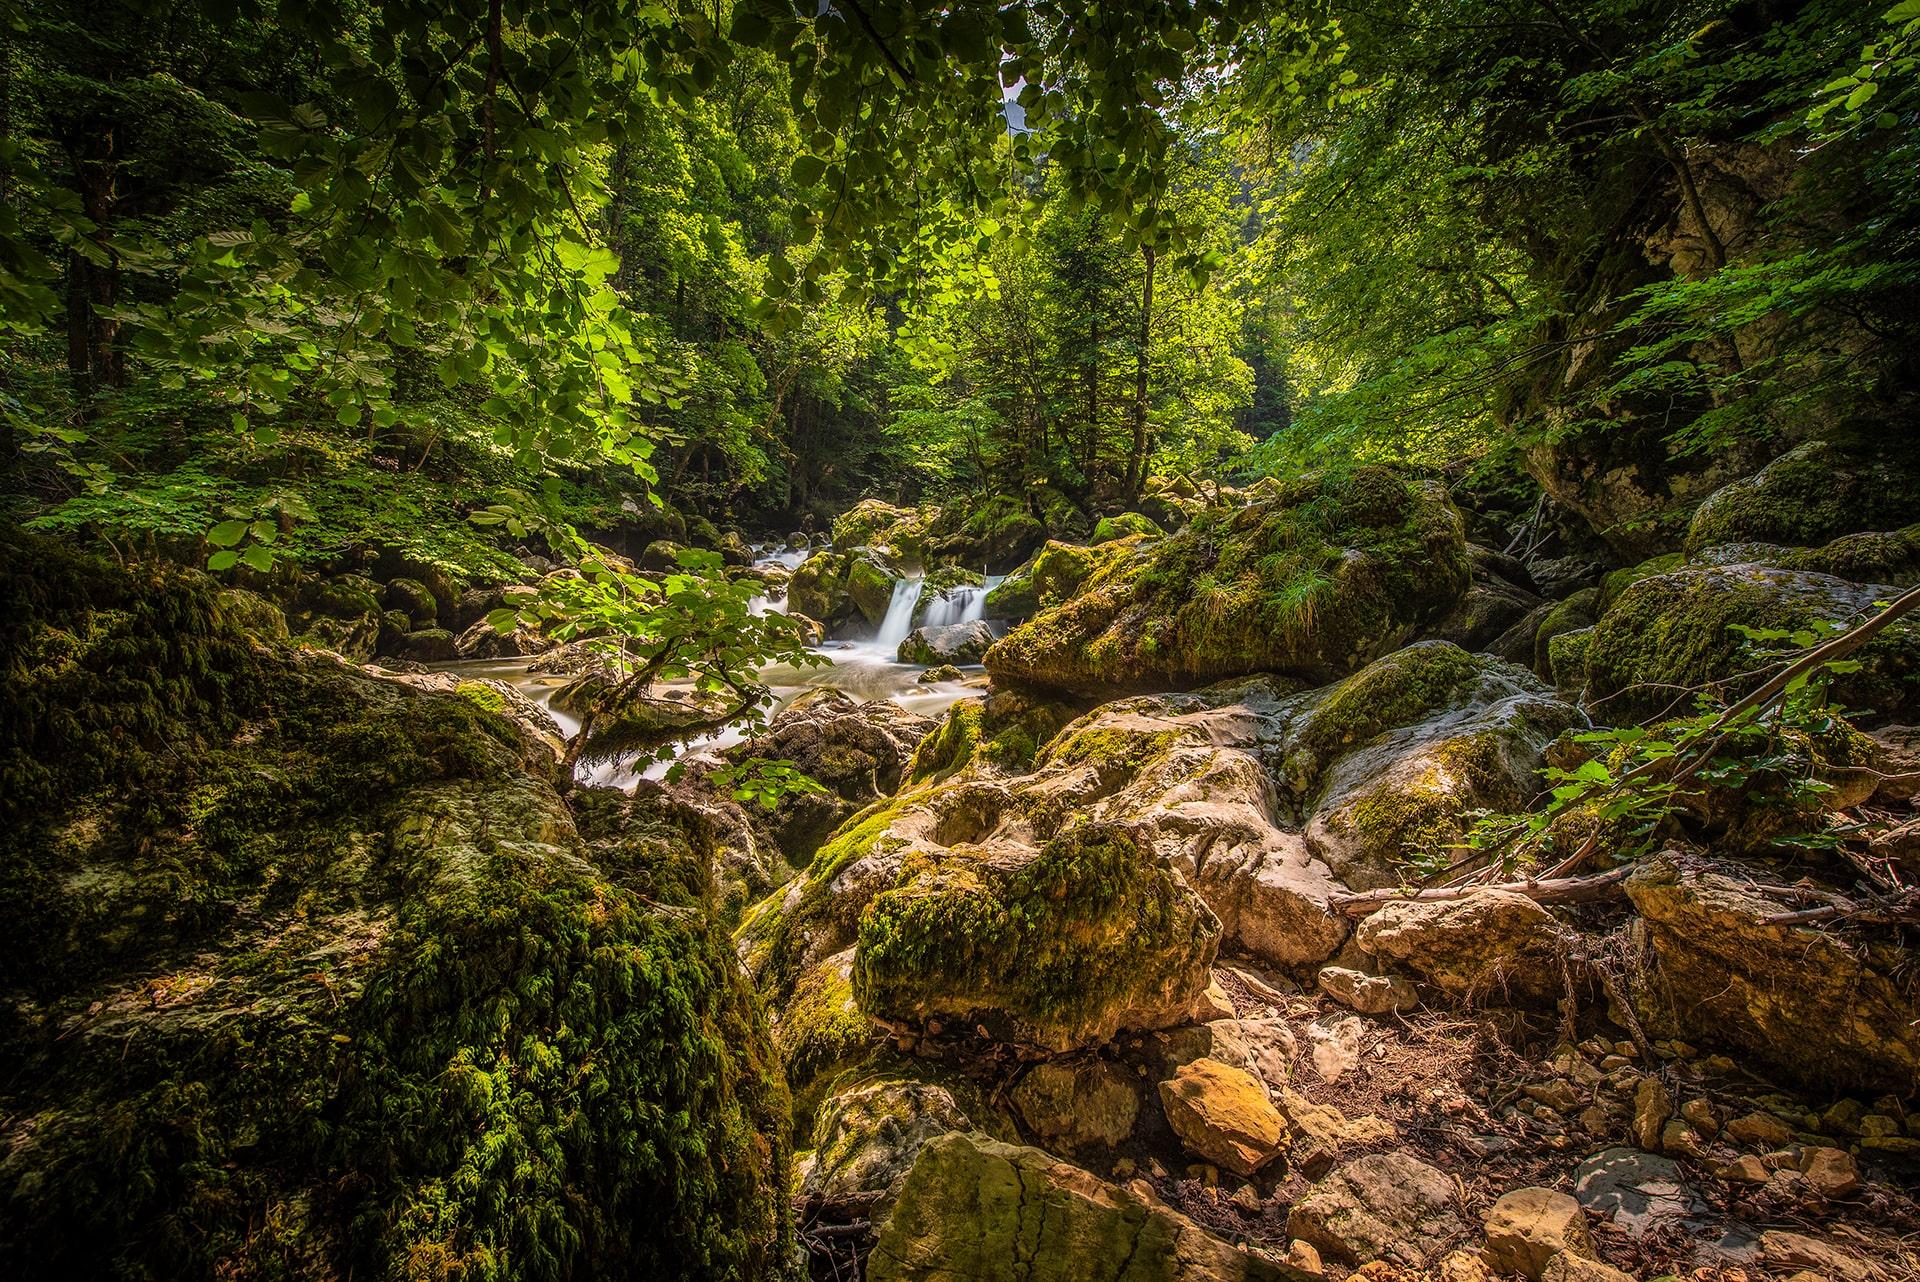 Blog Lifestyle - Promenade en plein nature suisse - Suivre sa Joie - Saskia Parein